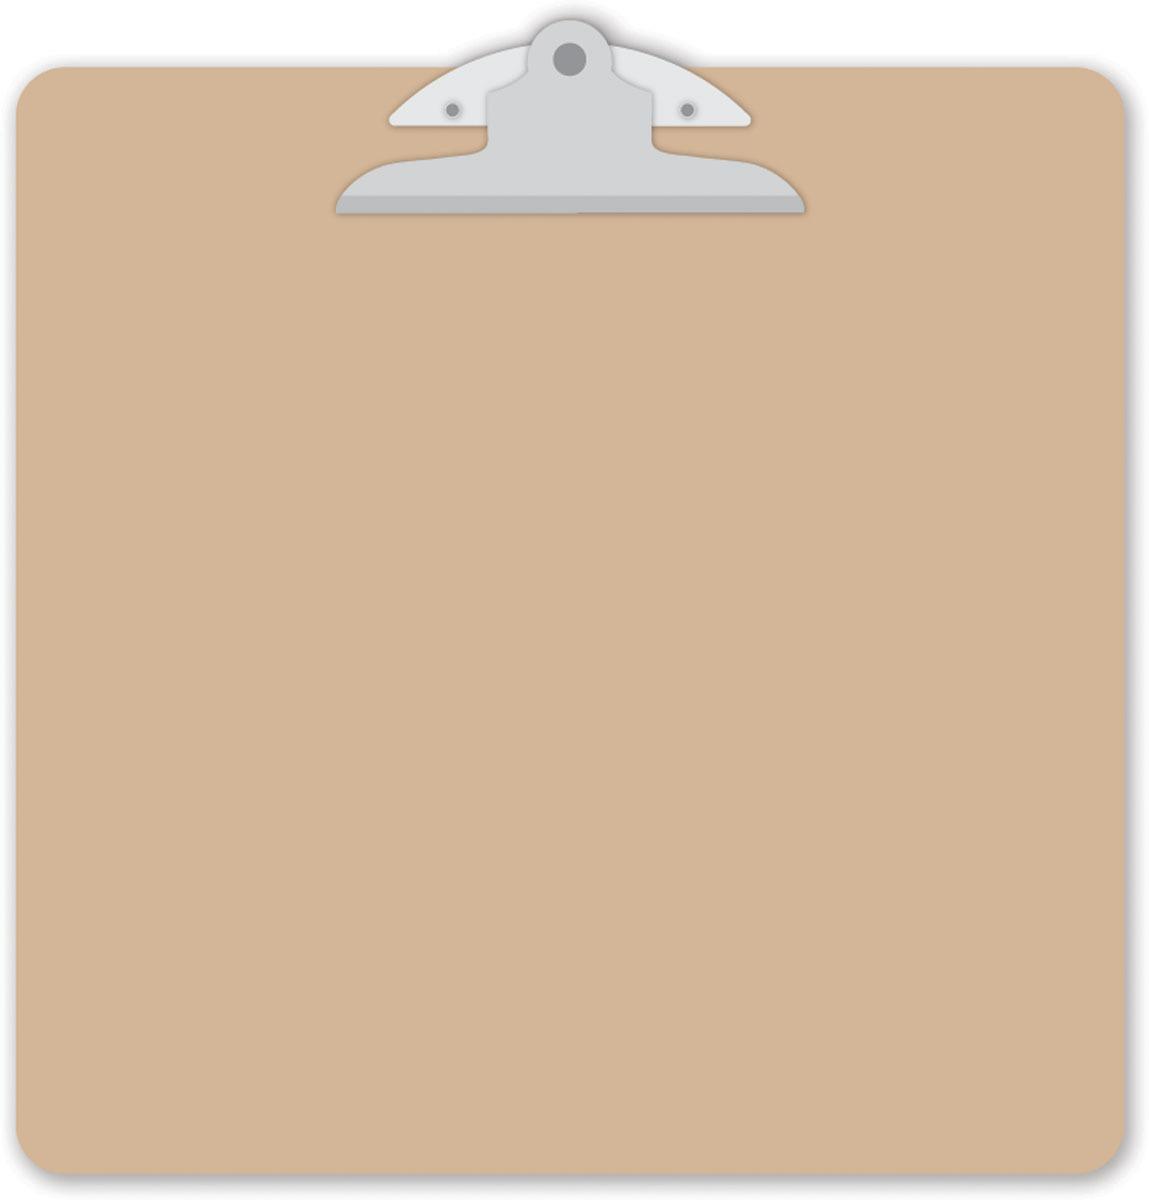 Clipart clipboard.